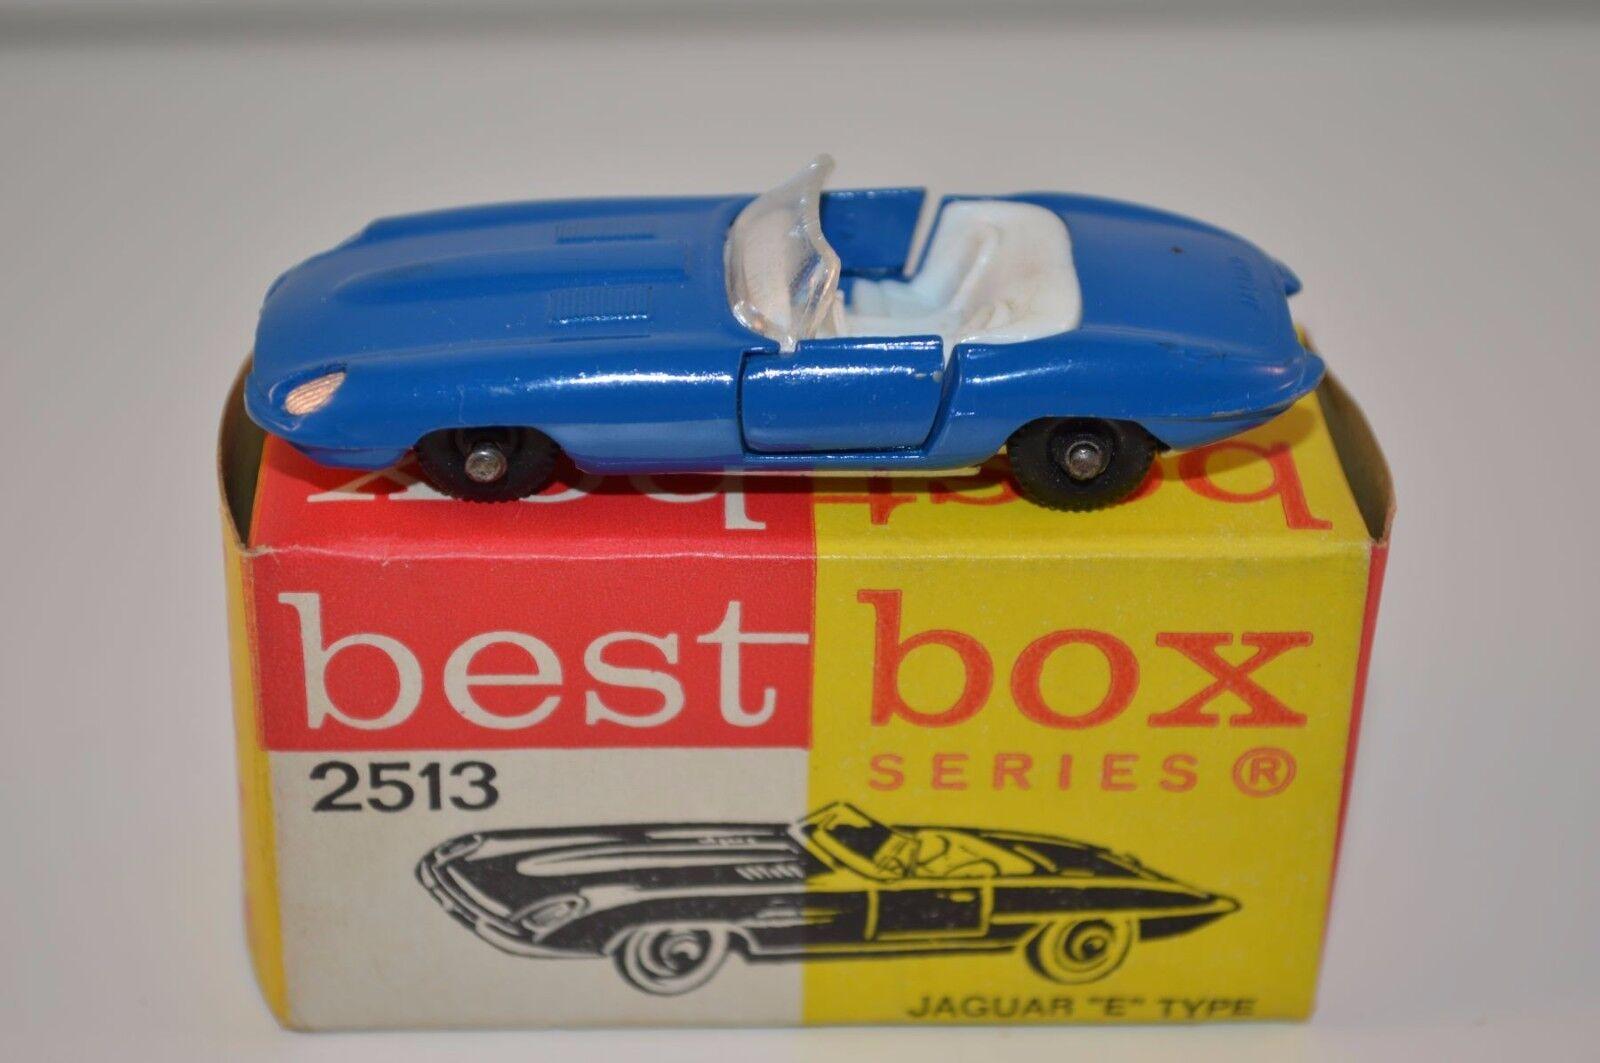 Bestbox Best Box 2513 Jaguar E Type very near mint in box very scarce colour